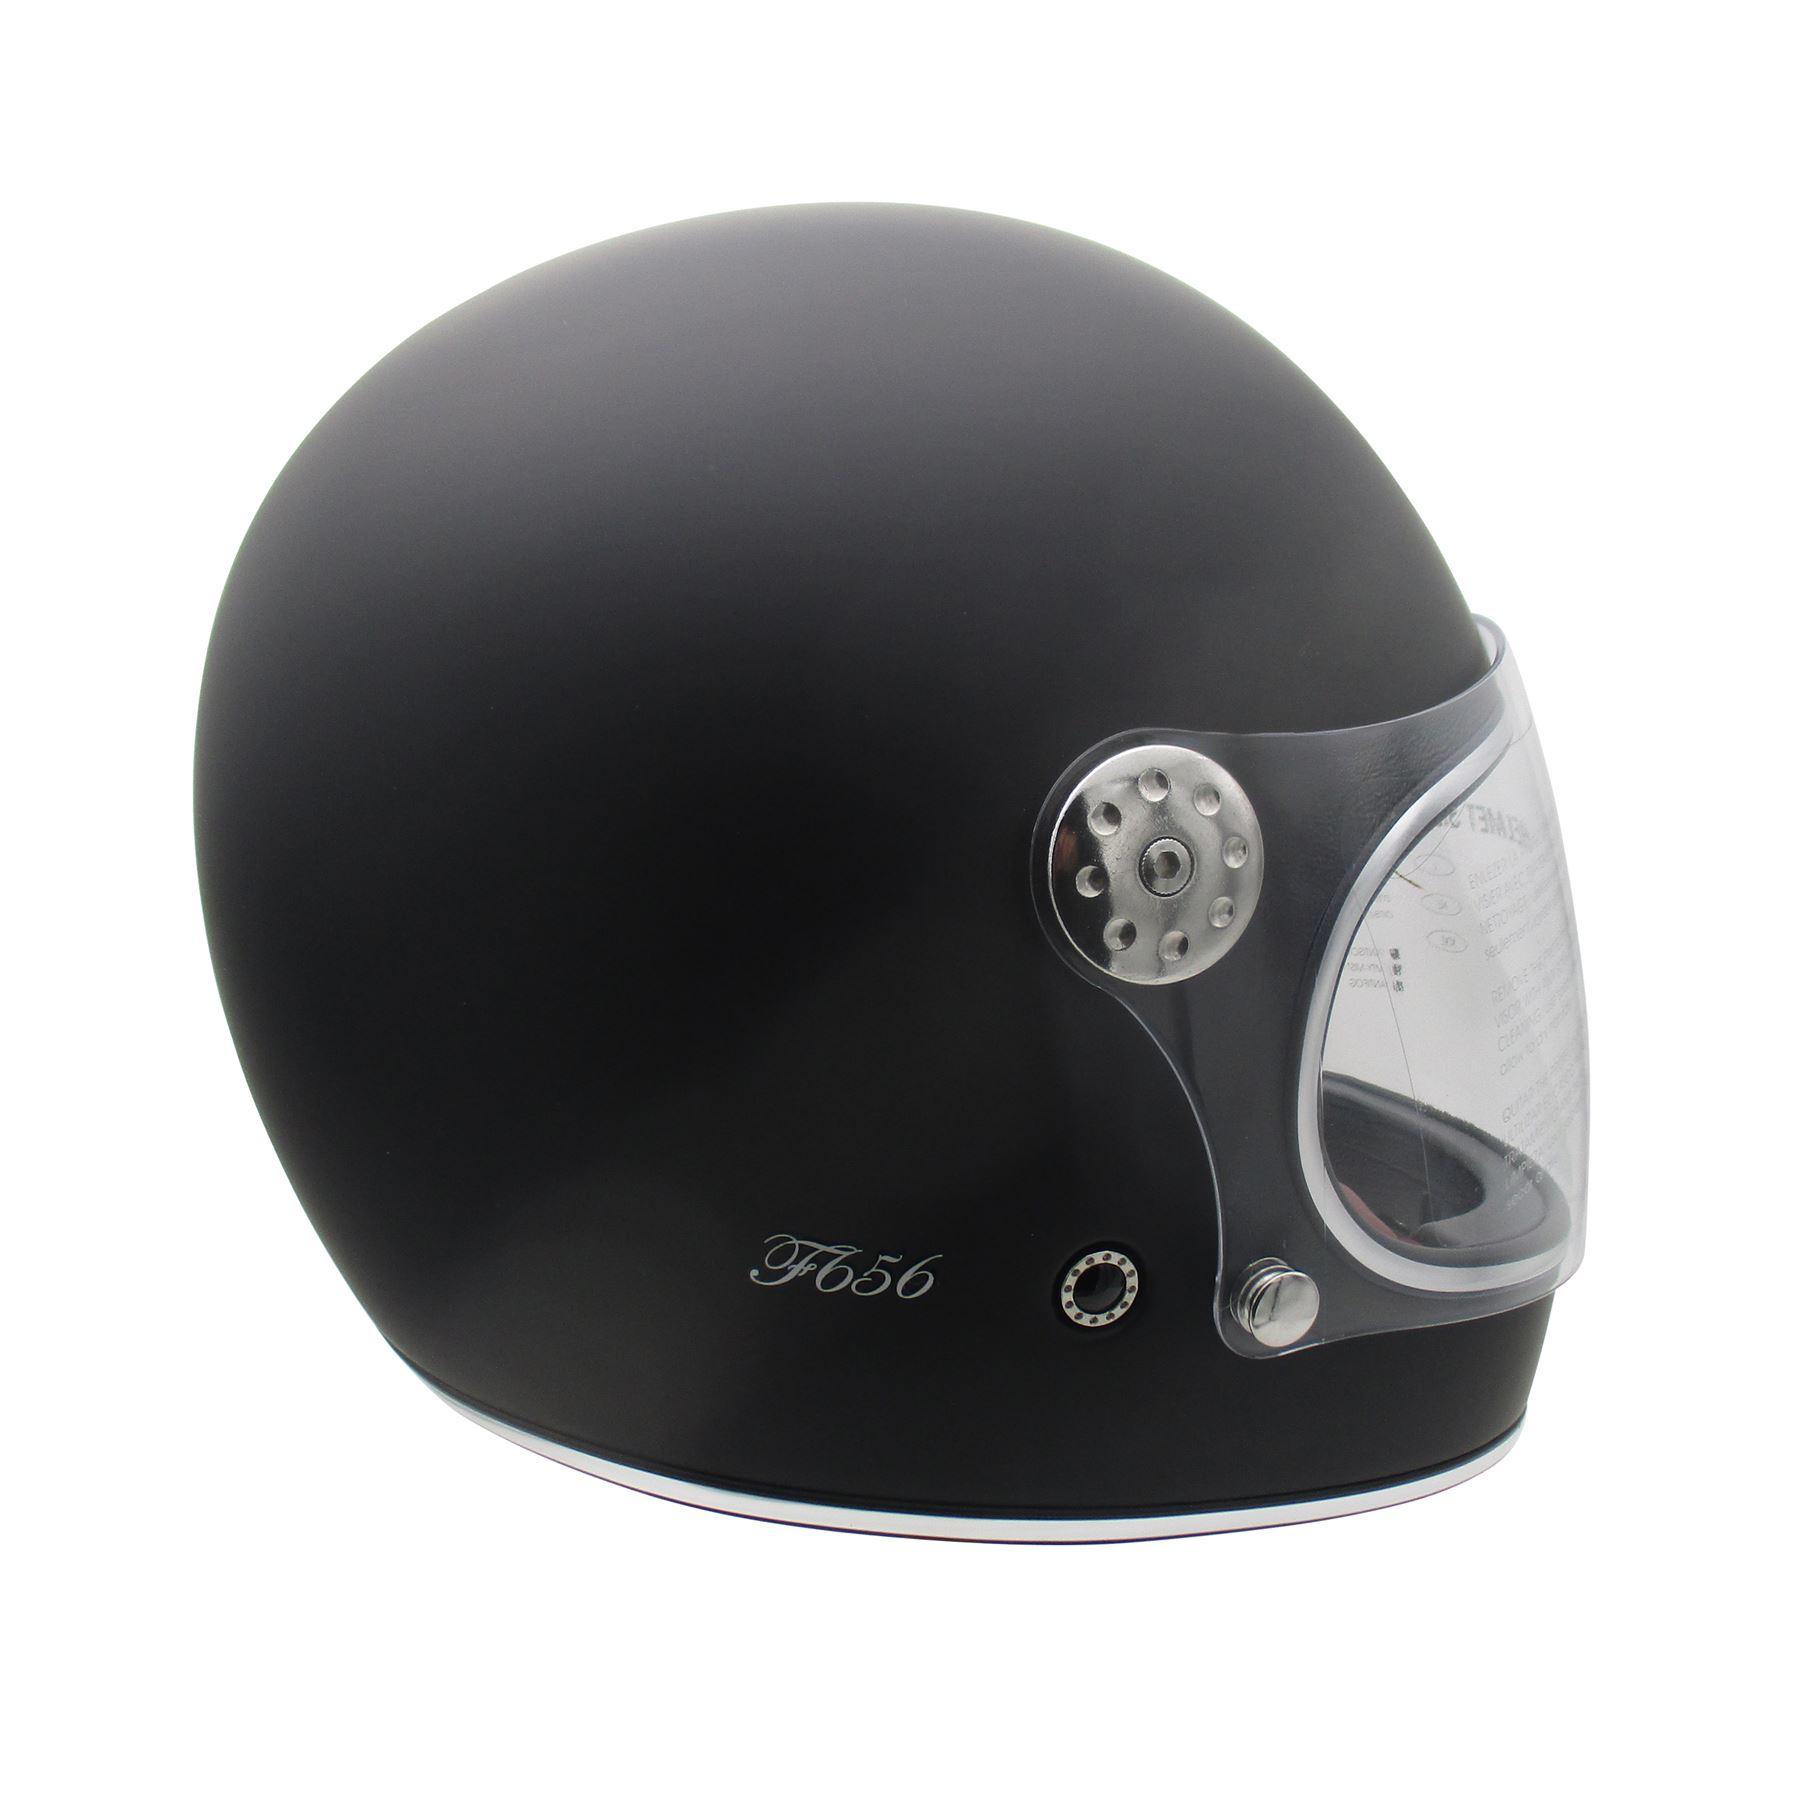 Viper-F656-Retro-Vintage-FibreGlass-Full-Face-Motorcycle-Bike-Road-Crash-Helmet miniature 18